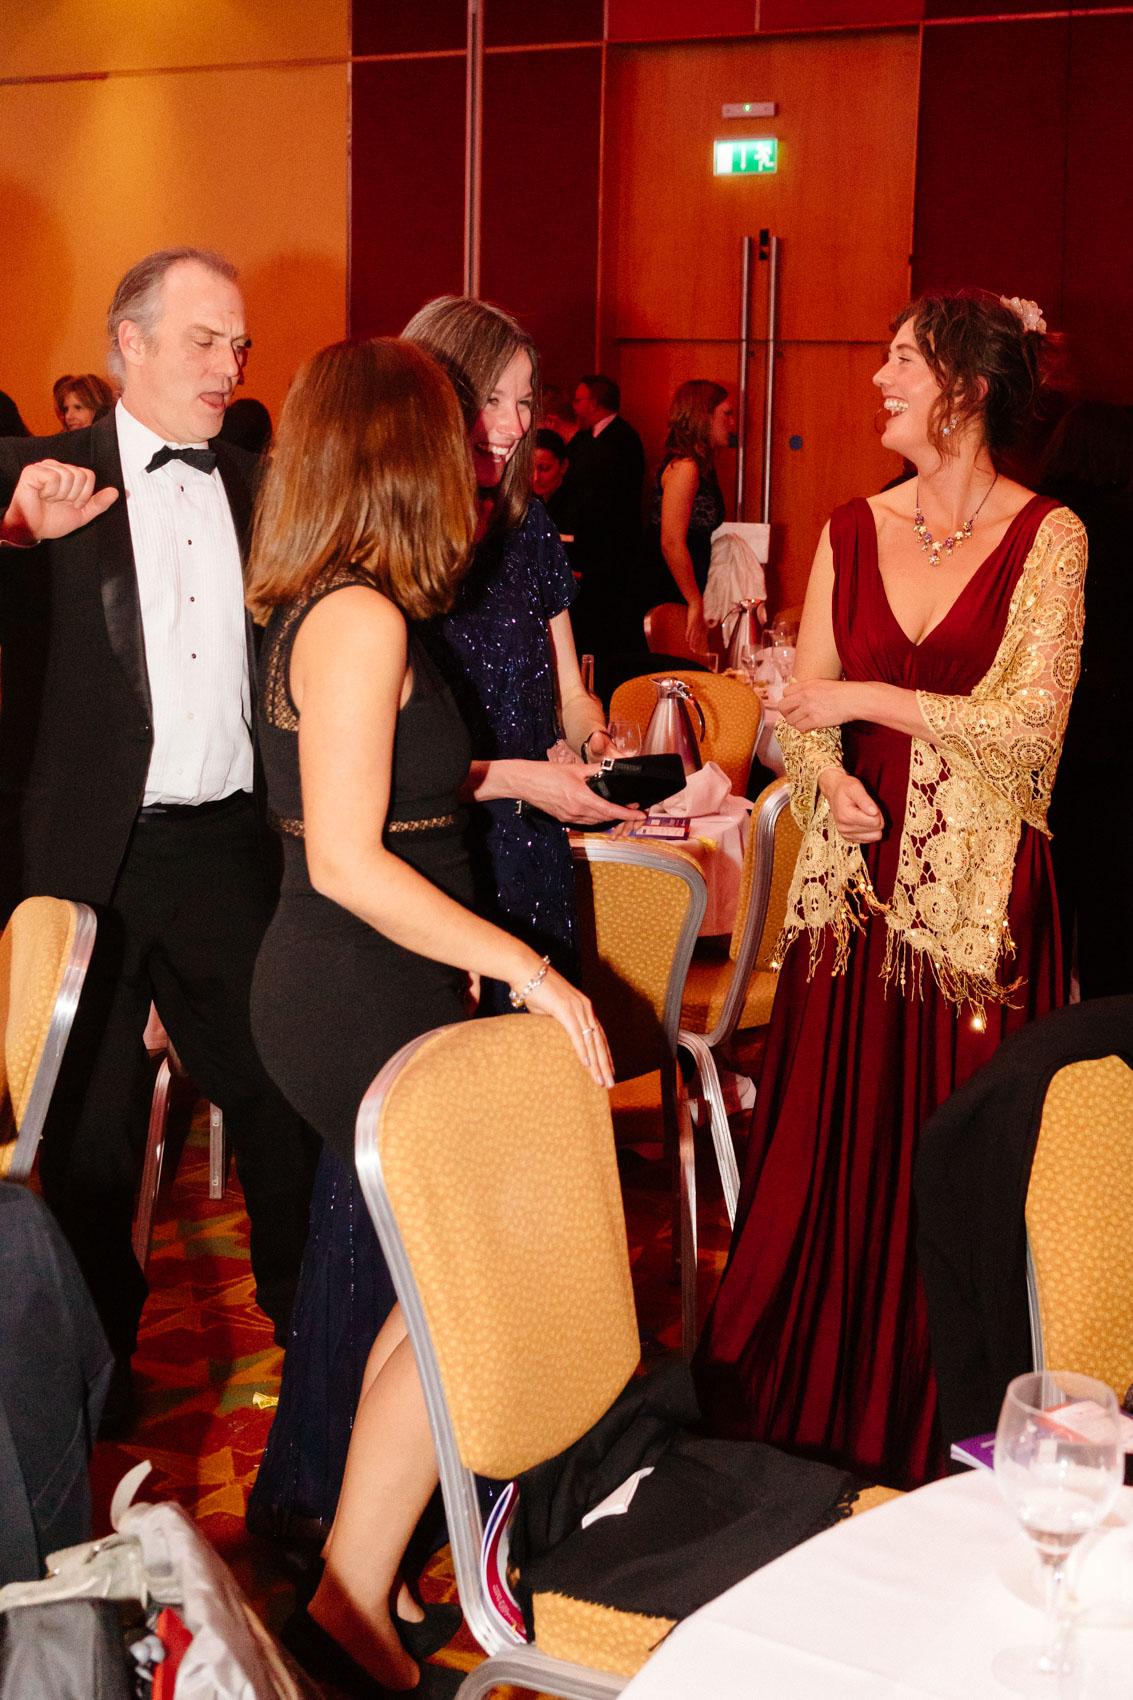 nmt-awards-2015_11_28-1376-125382-020.jpg